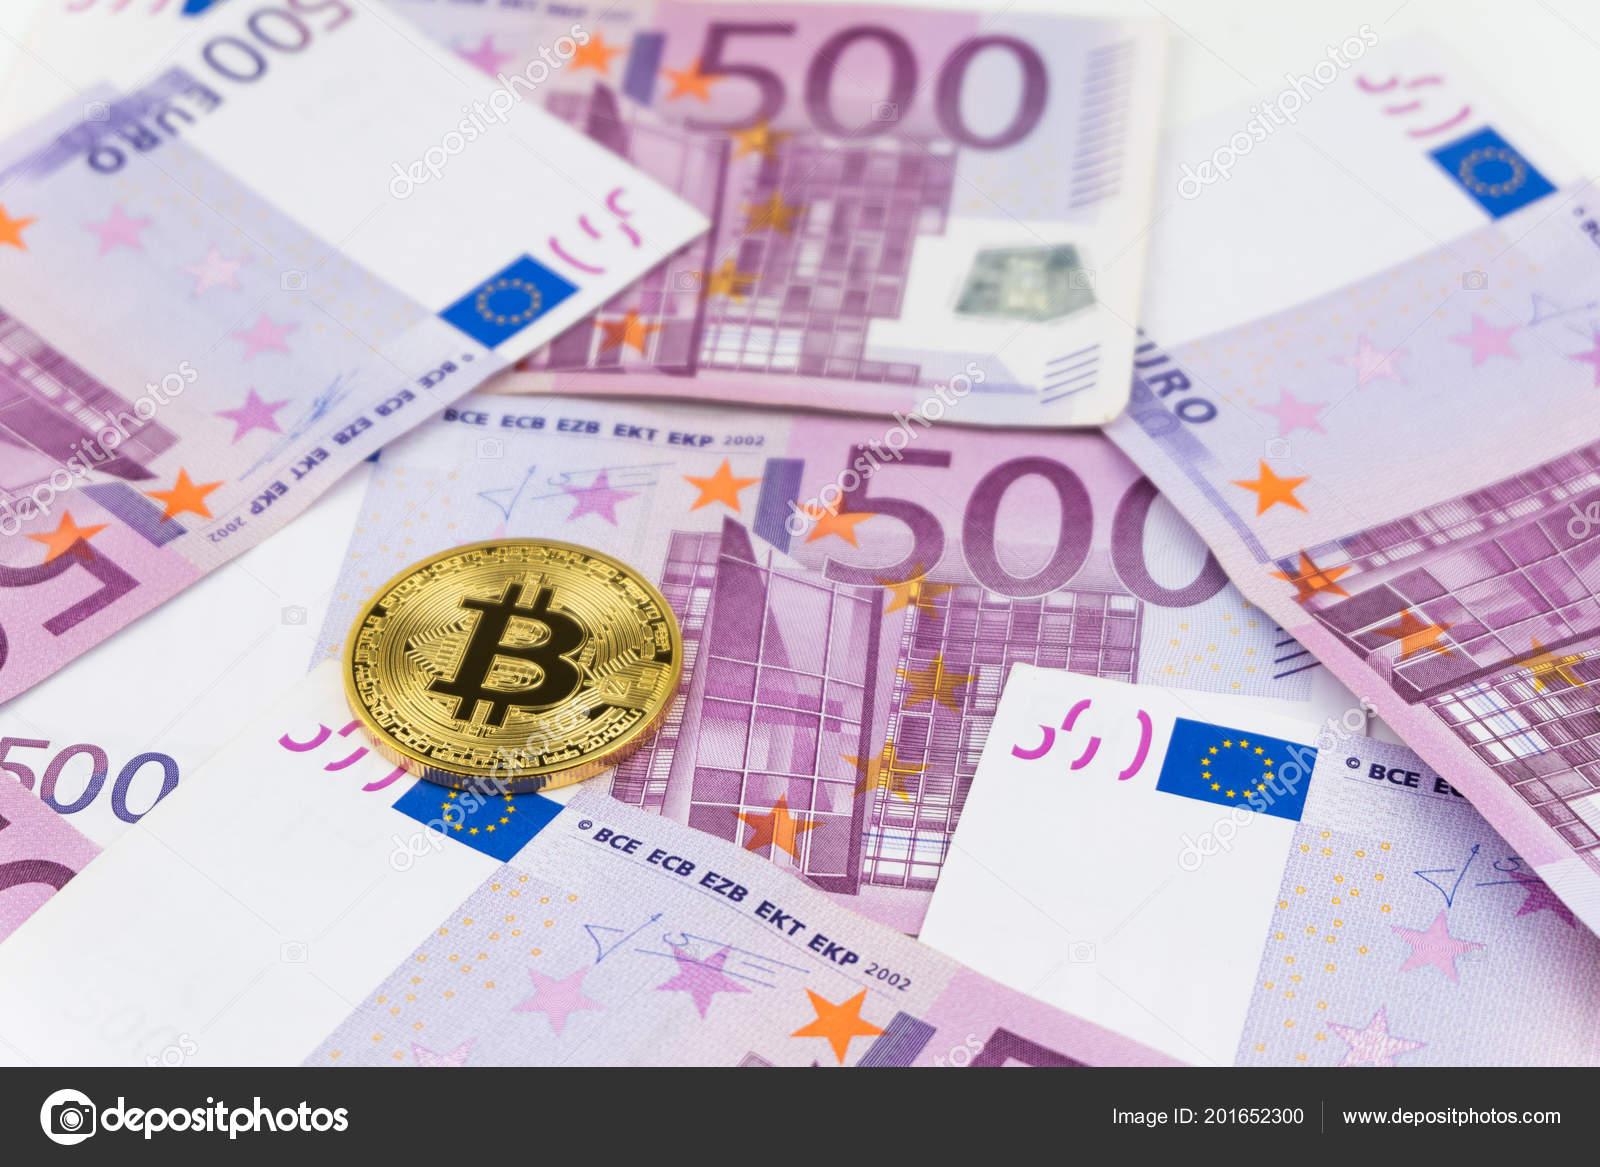 Quanto costa 4 500 Euro (Euro) in Bitcoin (Bitcoin)?